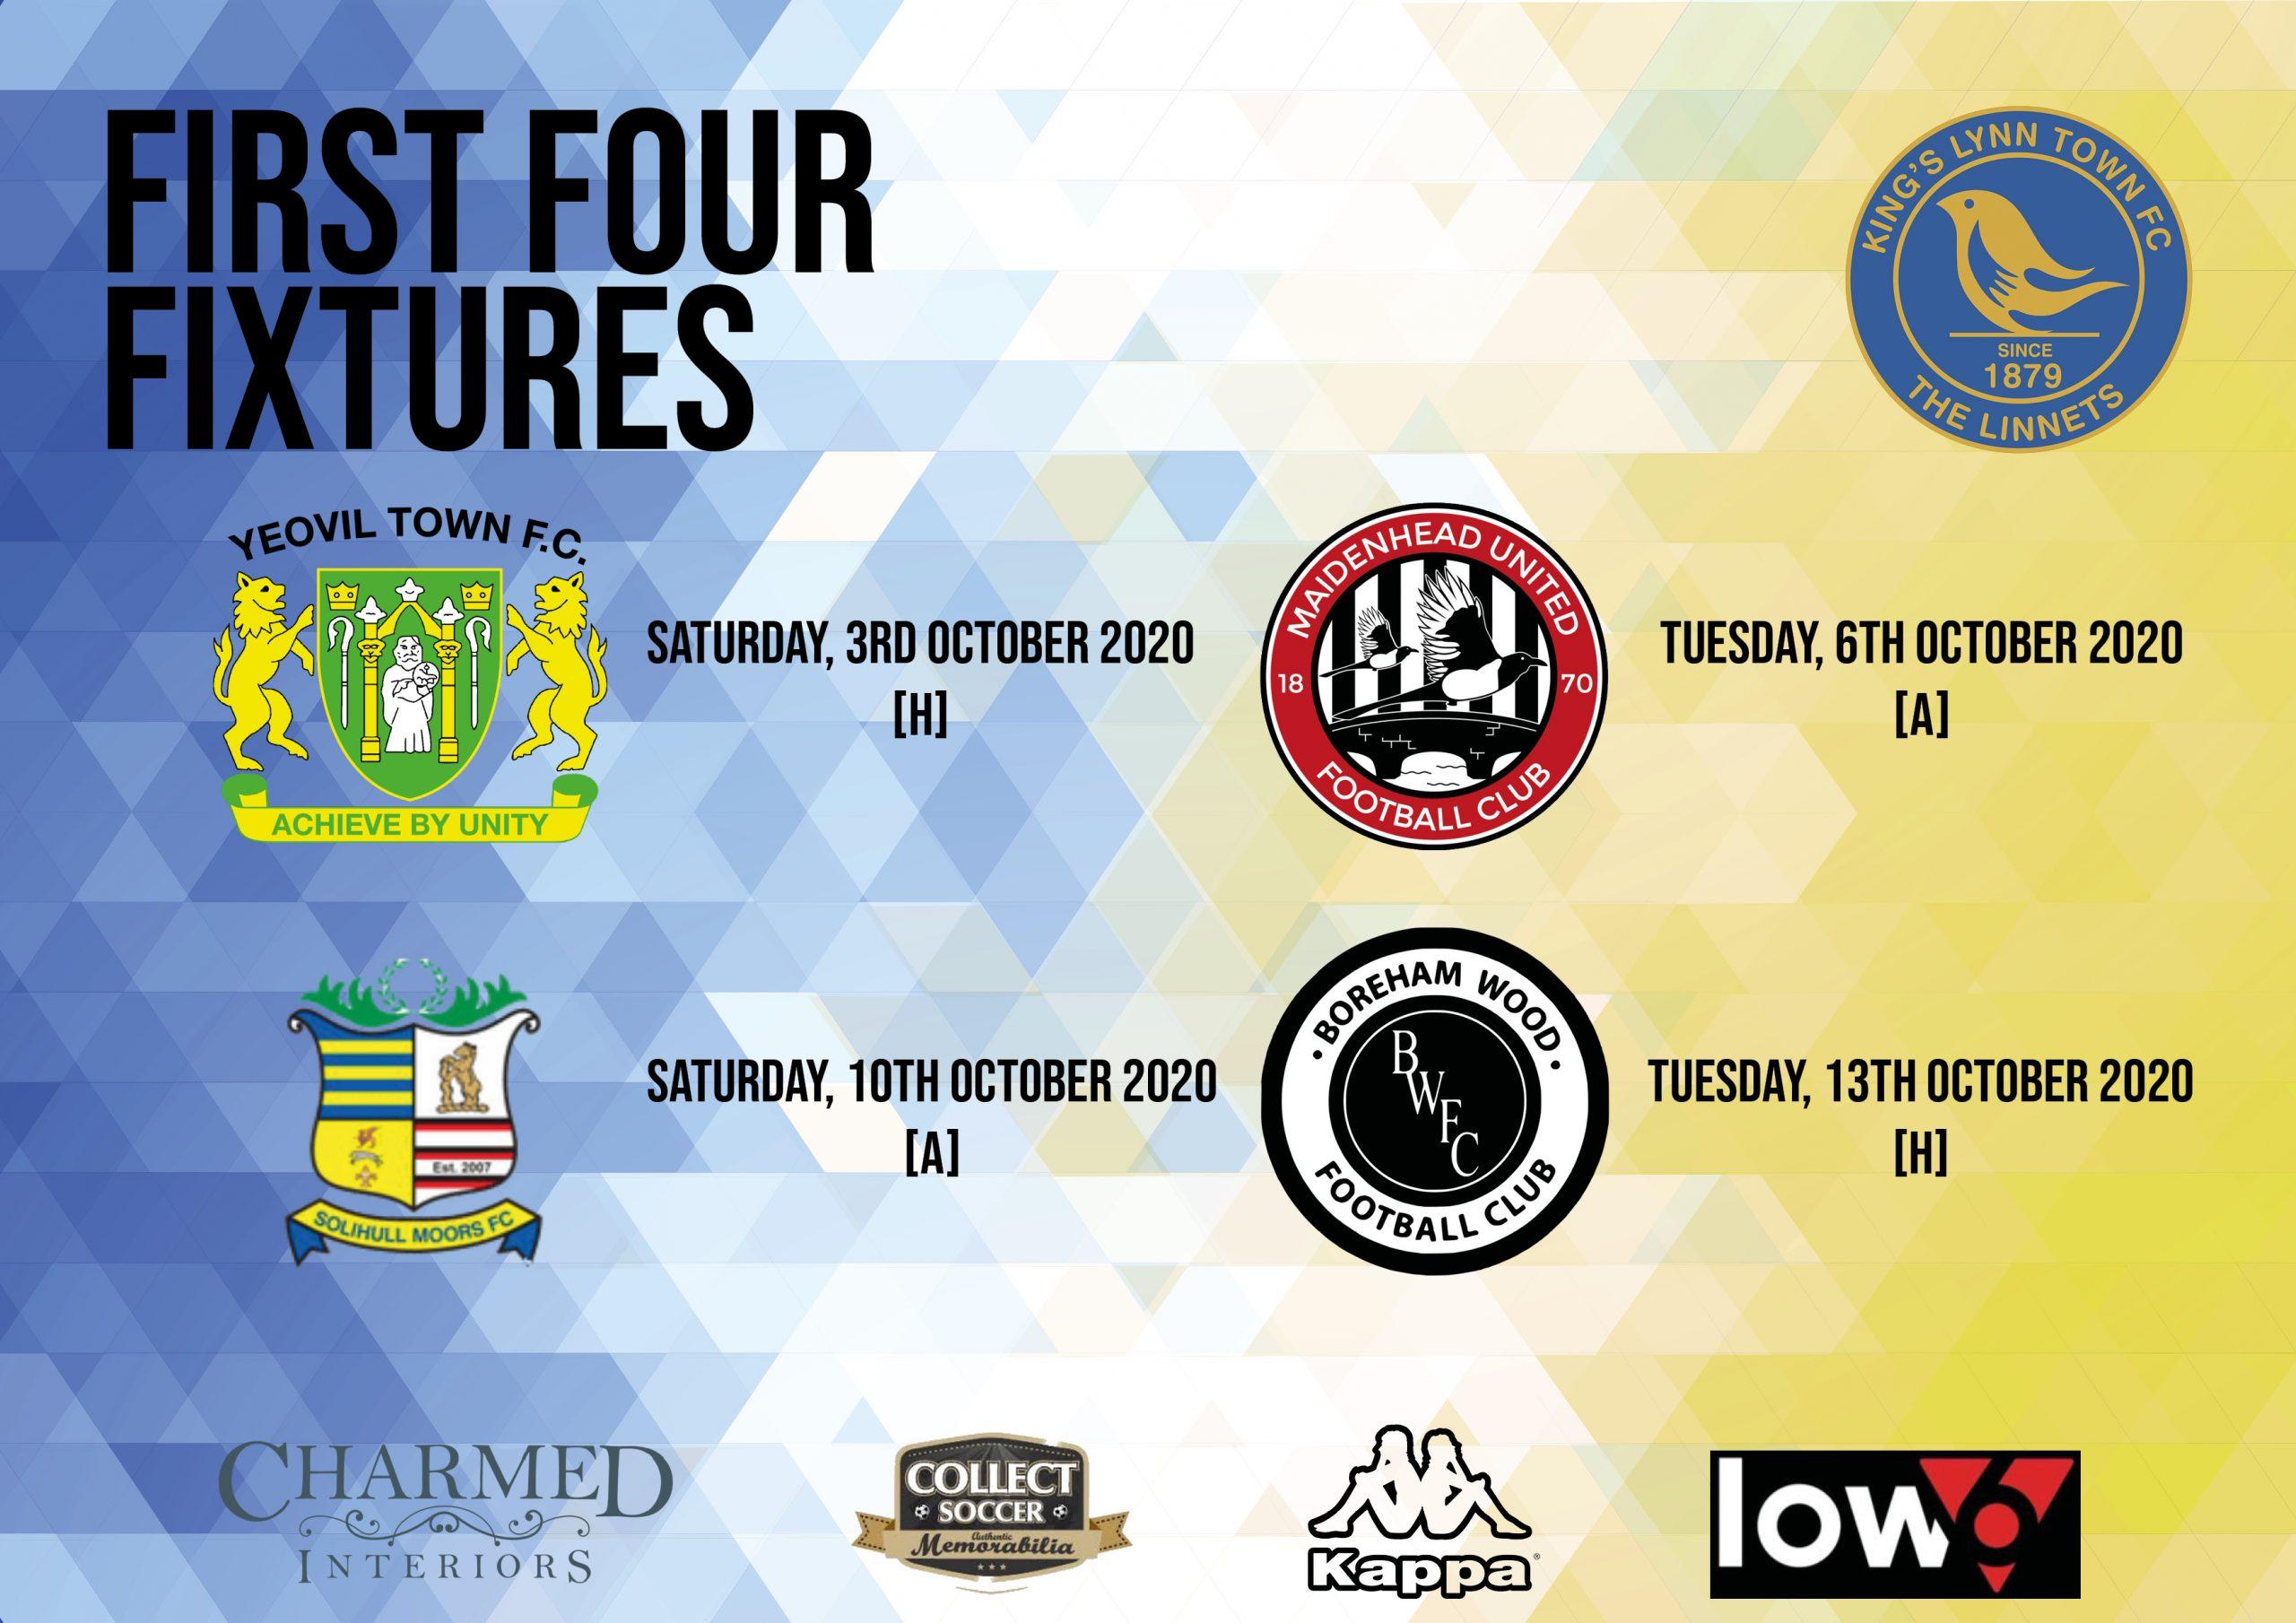 First Four Fixtures